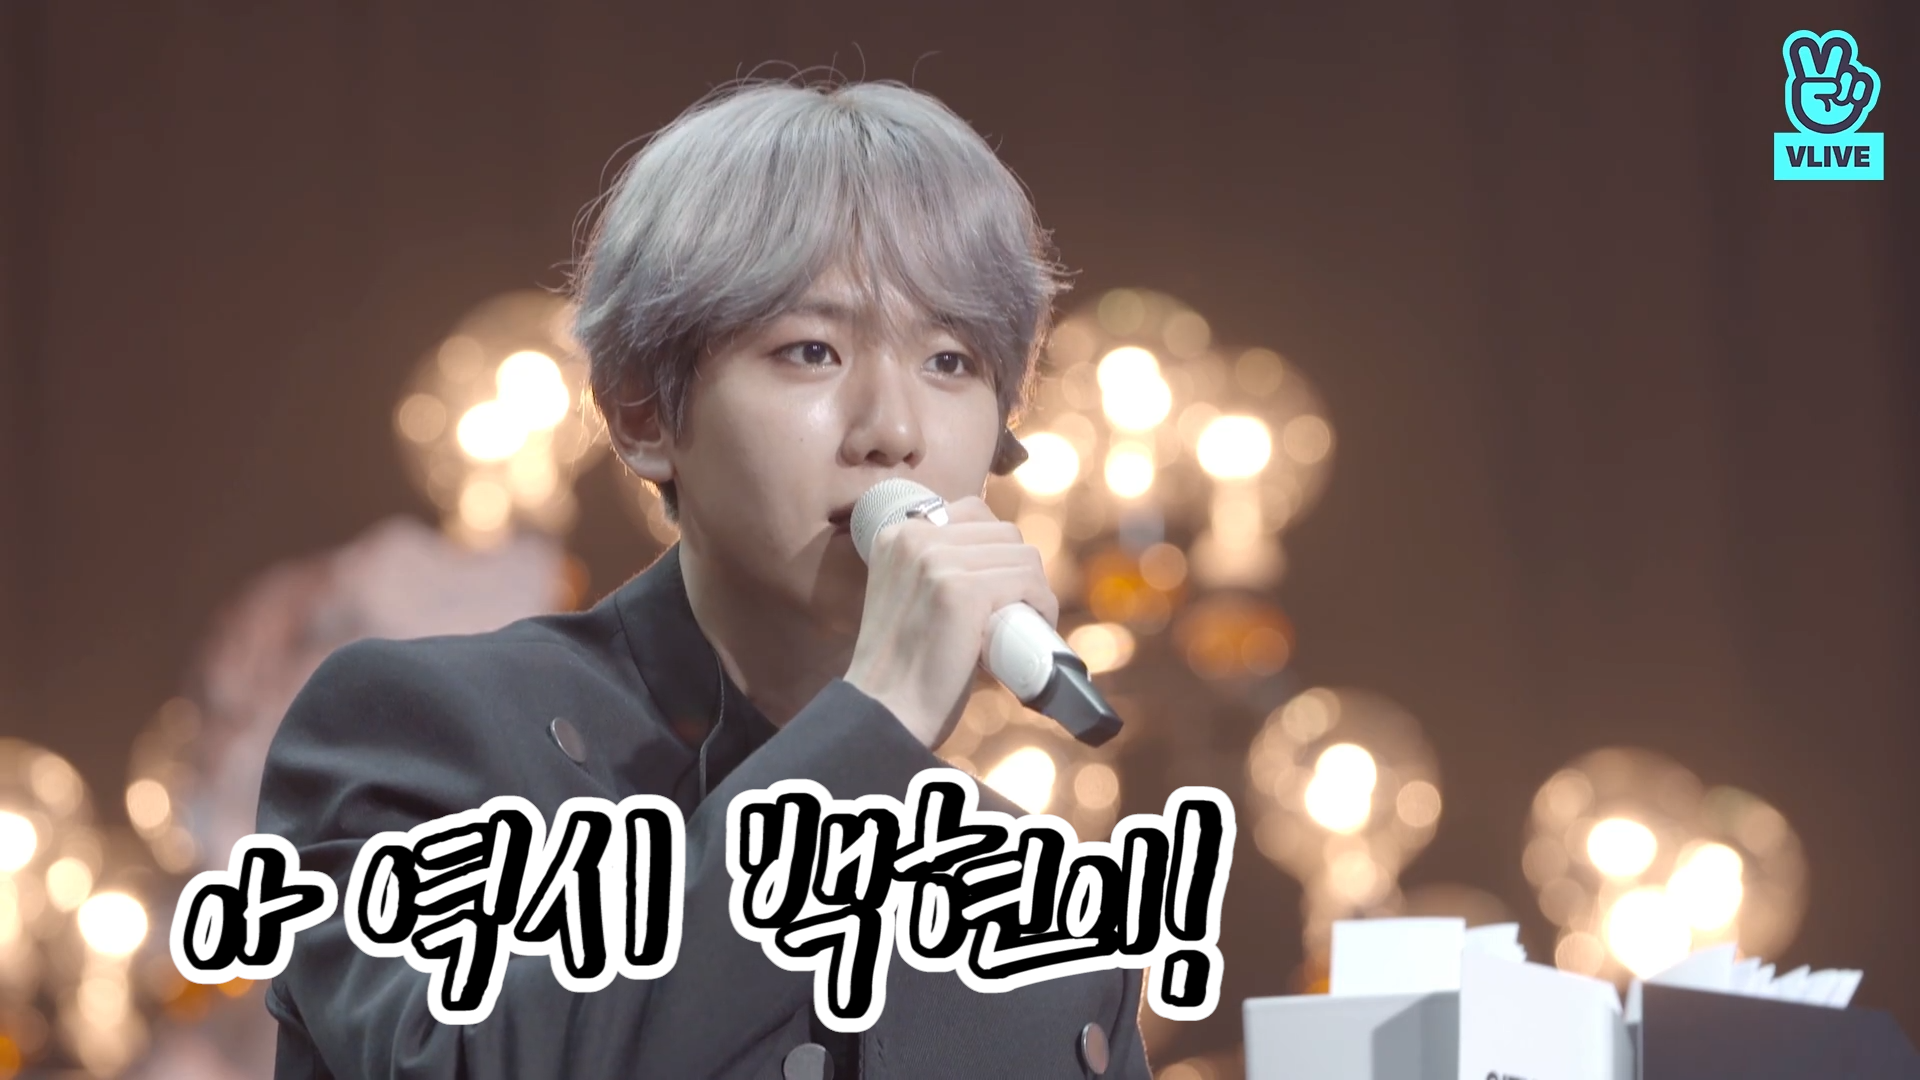 [EXO] 너무 좋아서 제 영혼 큥 따라 유엔빌리지 언덕갔다가 그대로 승천했어요~ 'ㅅ'❣ (BAEKHYUN's first solo showcase!)